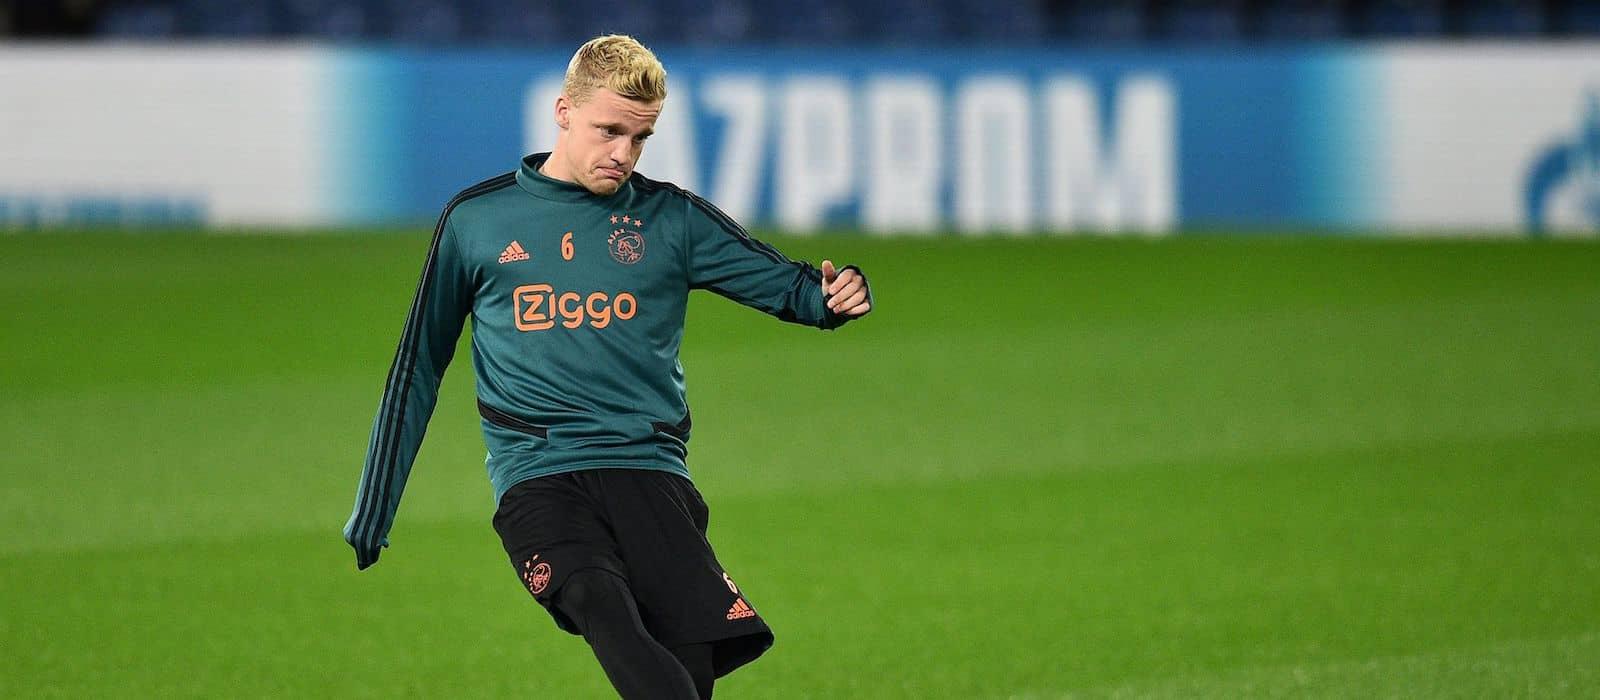 Donny van de Beek pictured in Manchester United's new kit